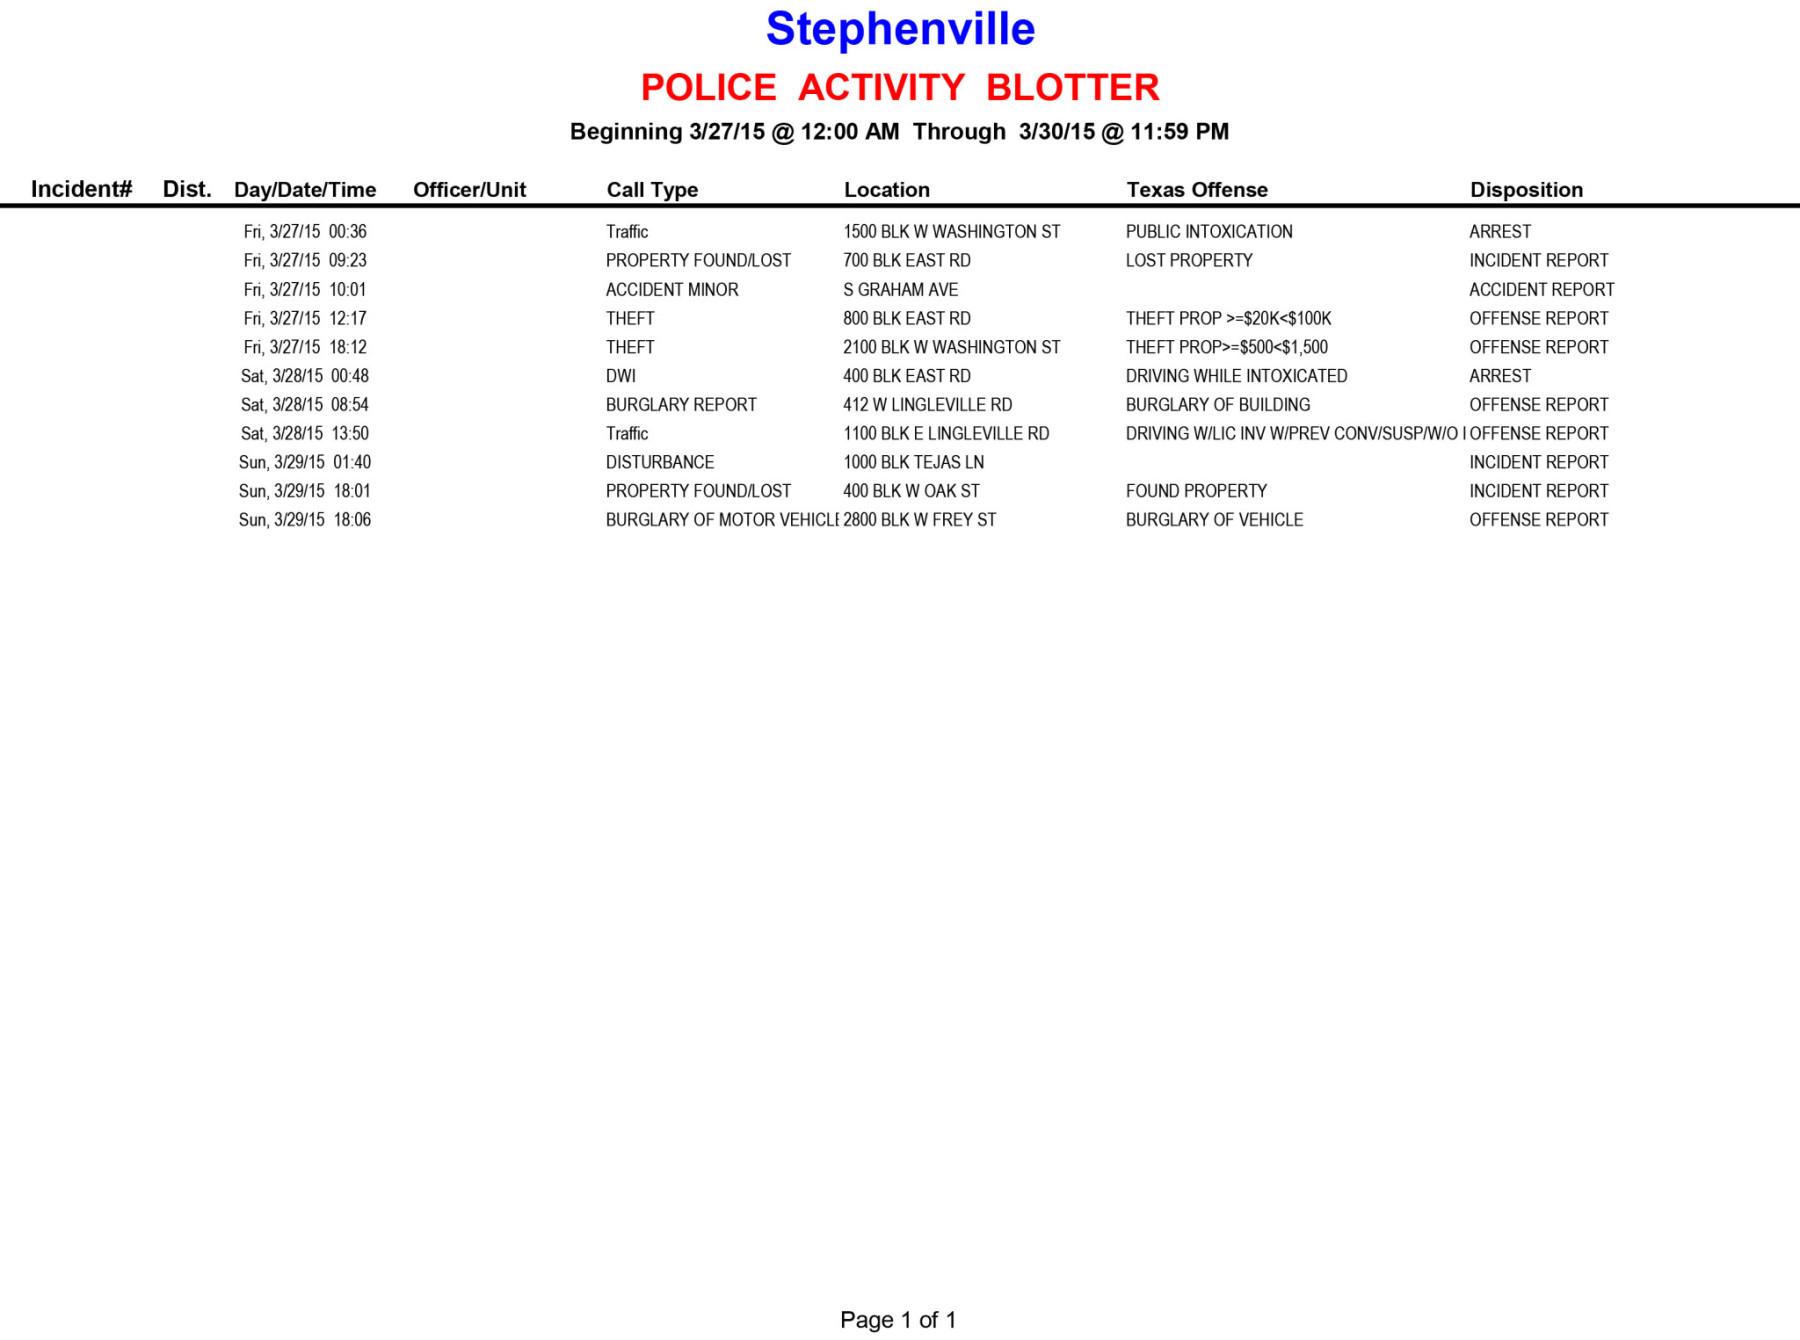 20150327-0330 Police Activity Blotter